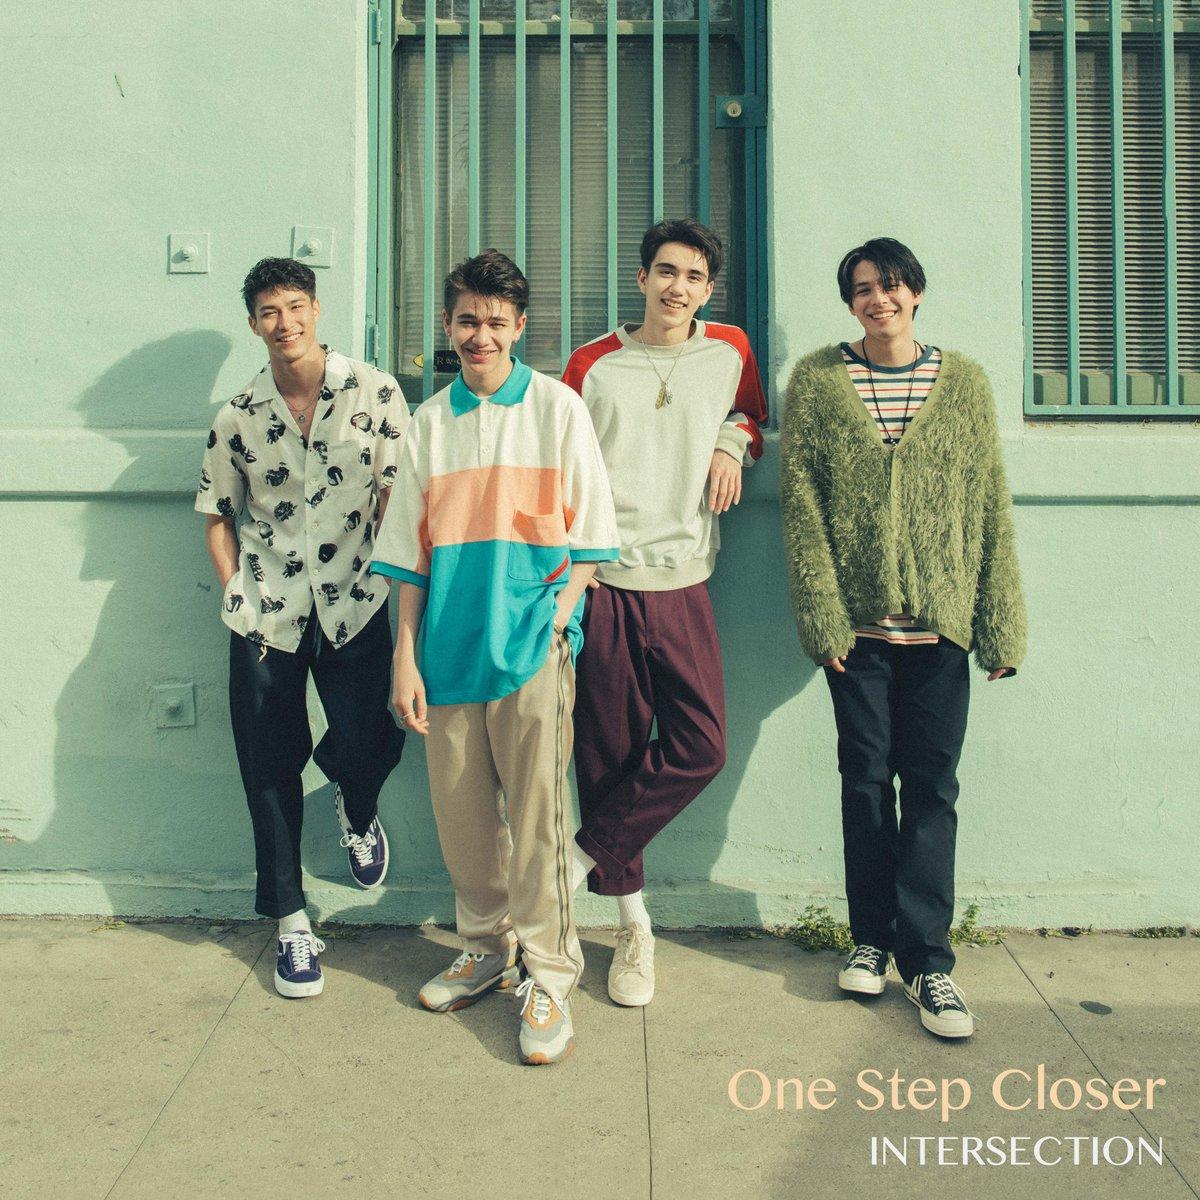 『One Step Closer』収録の『One Step Closer』ジャケット